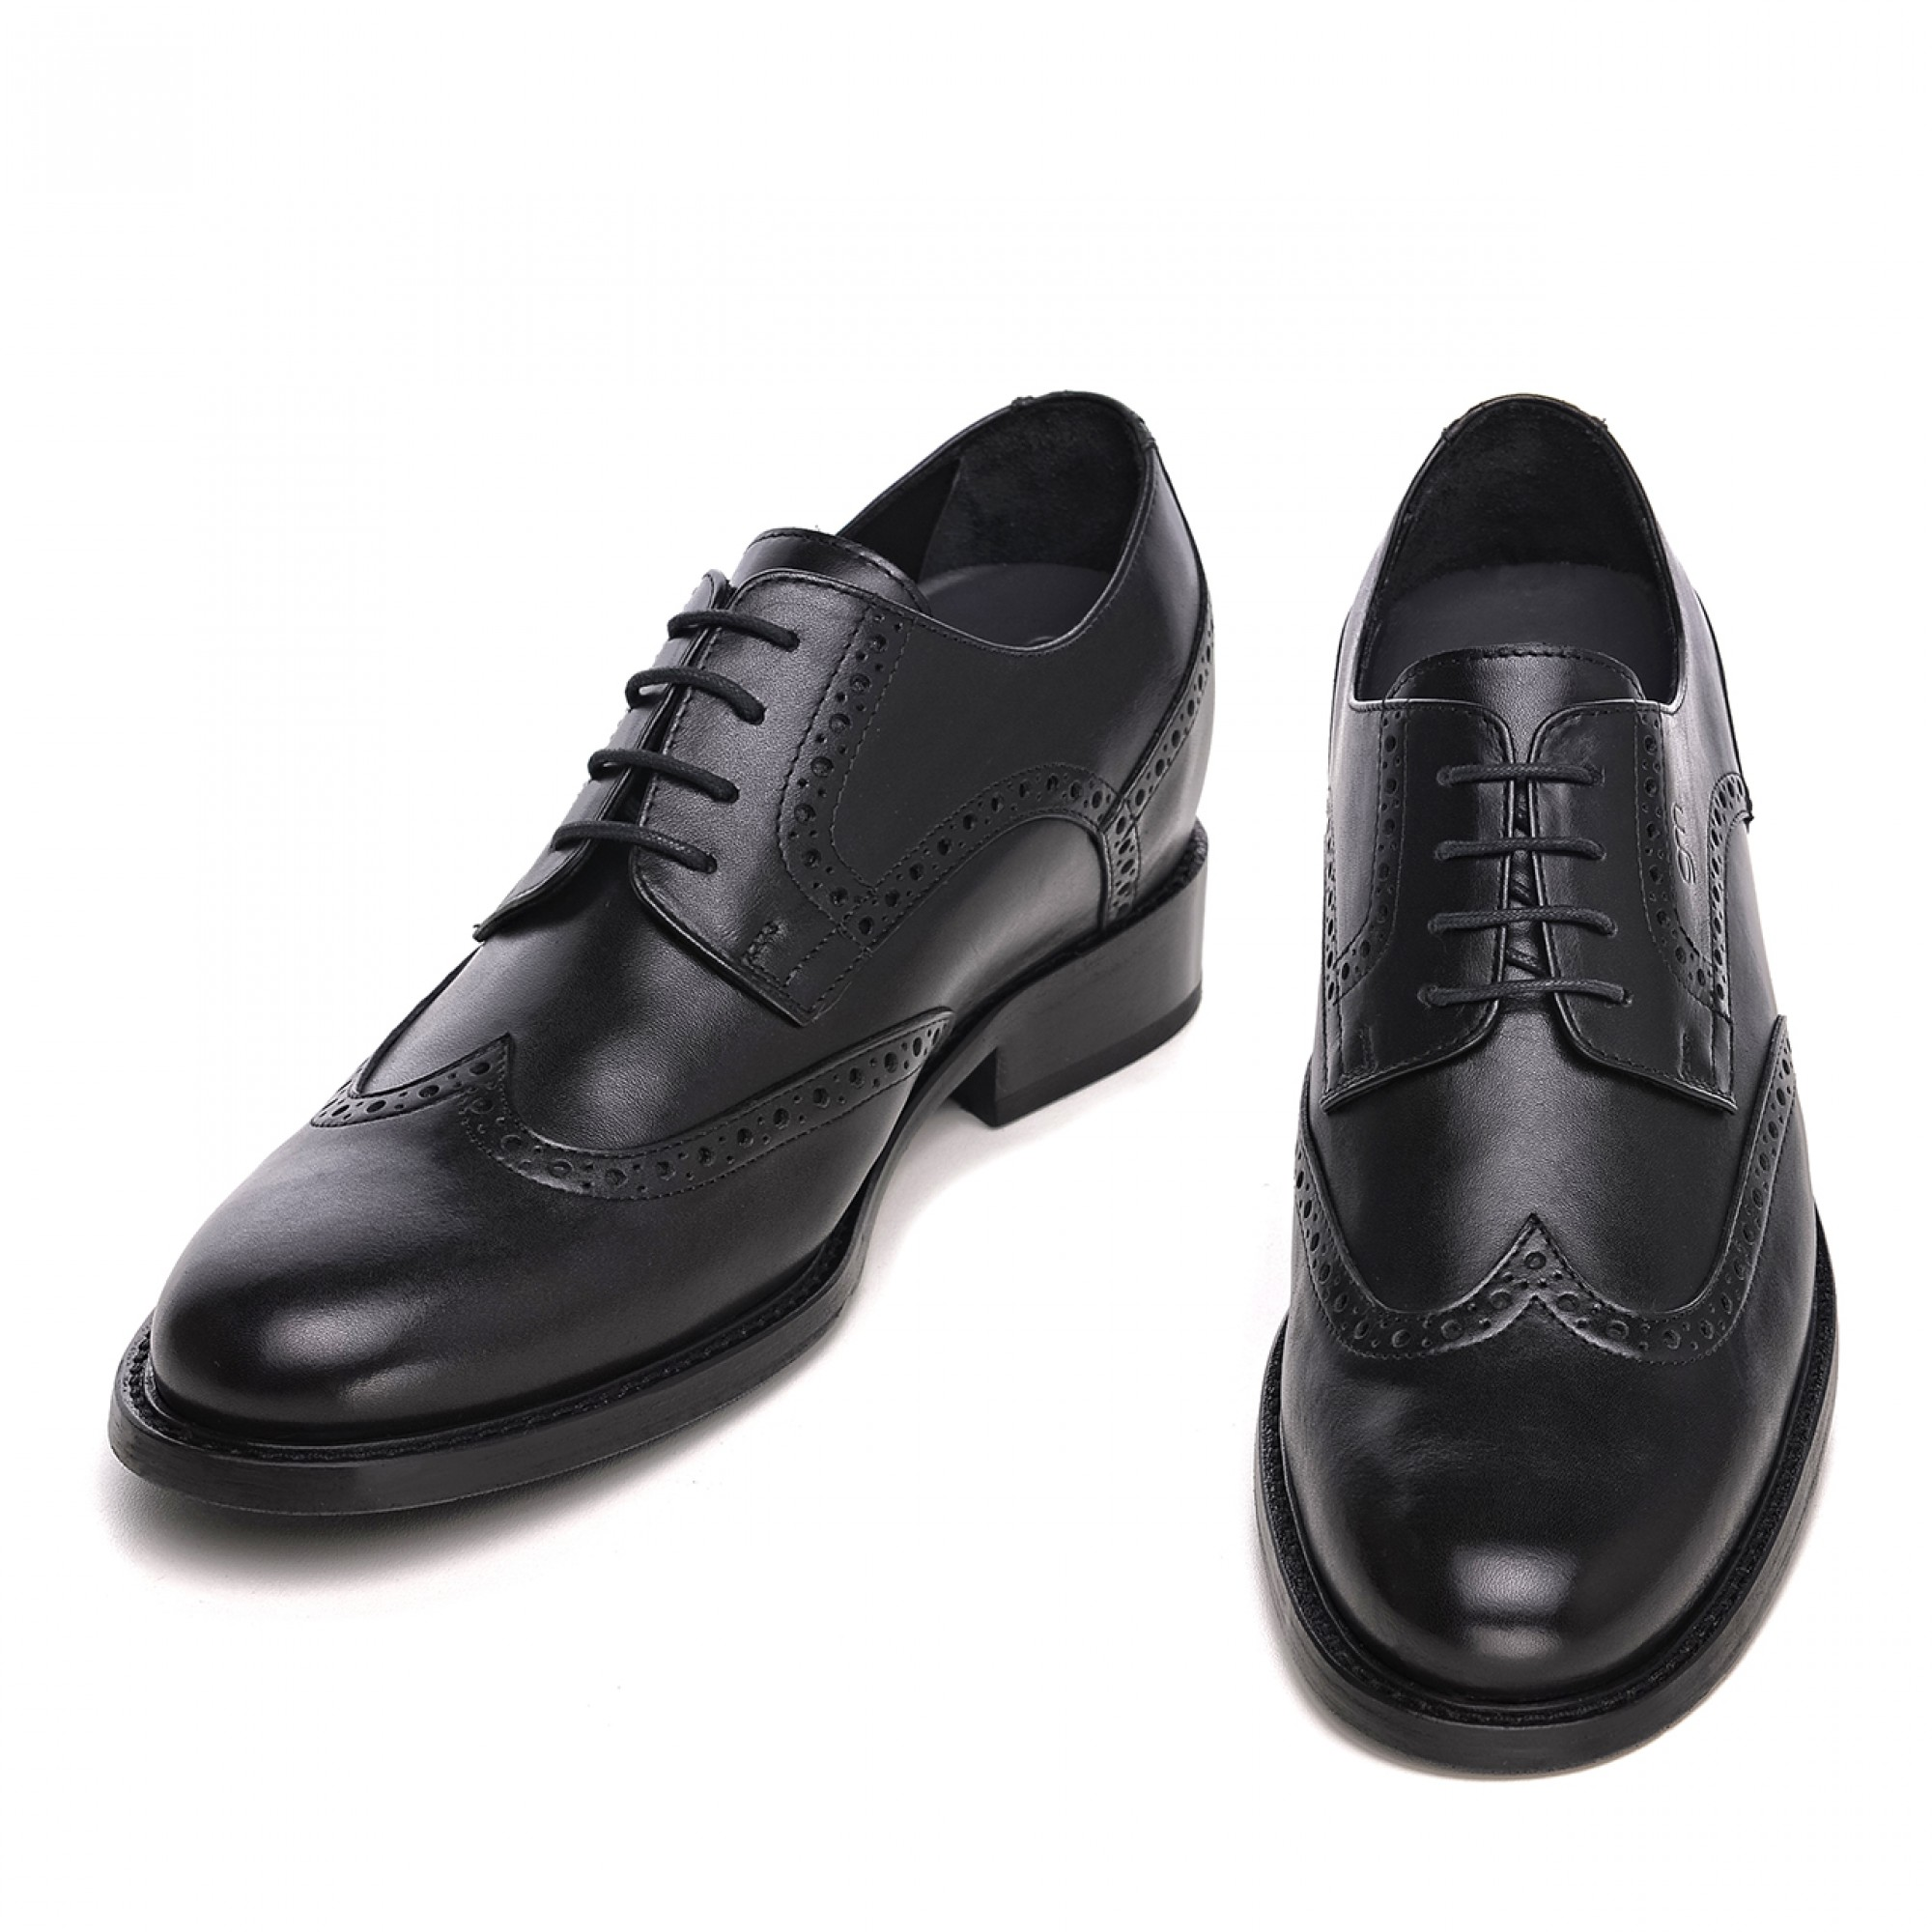 Chaussures derby réhaussantes